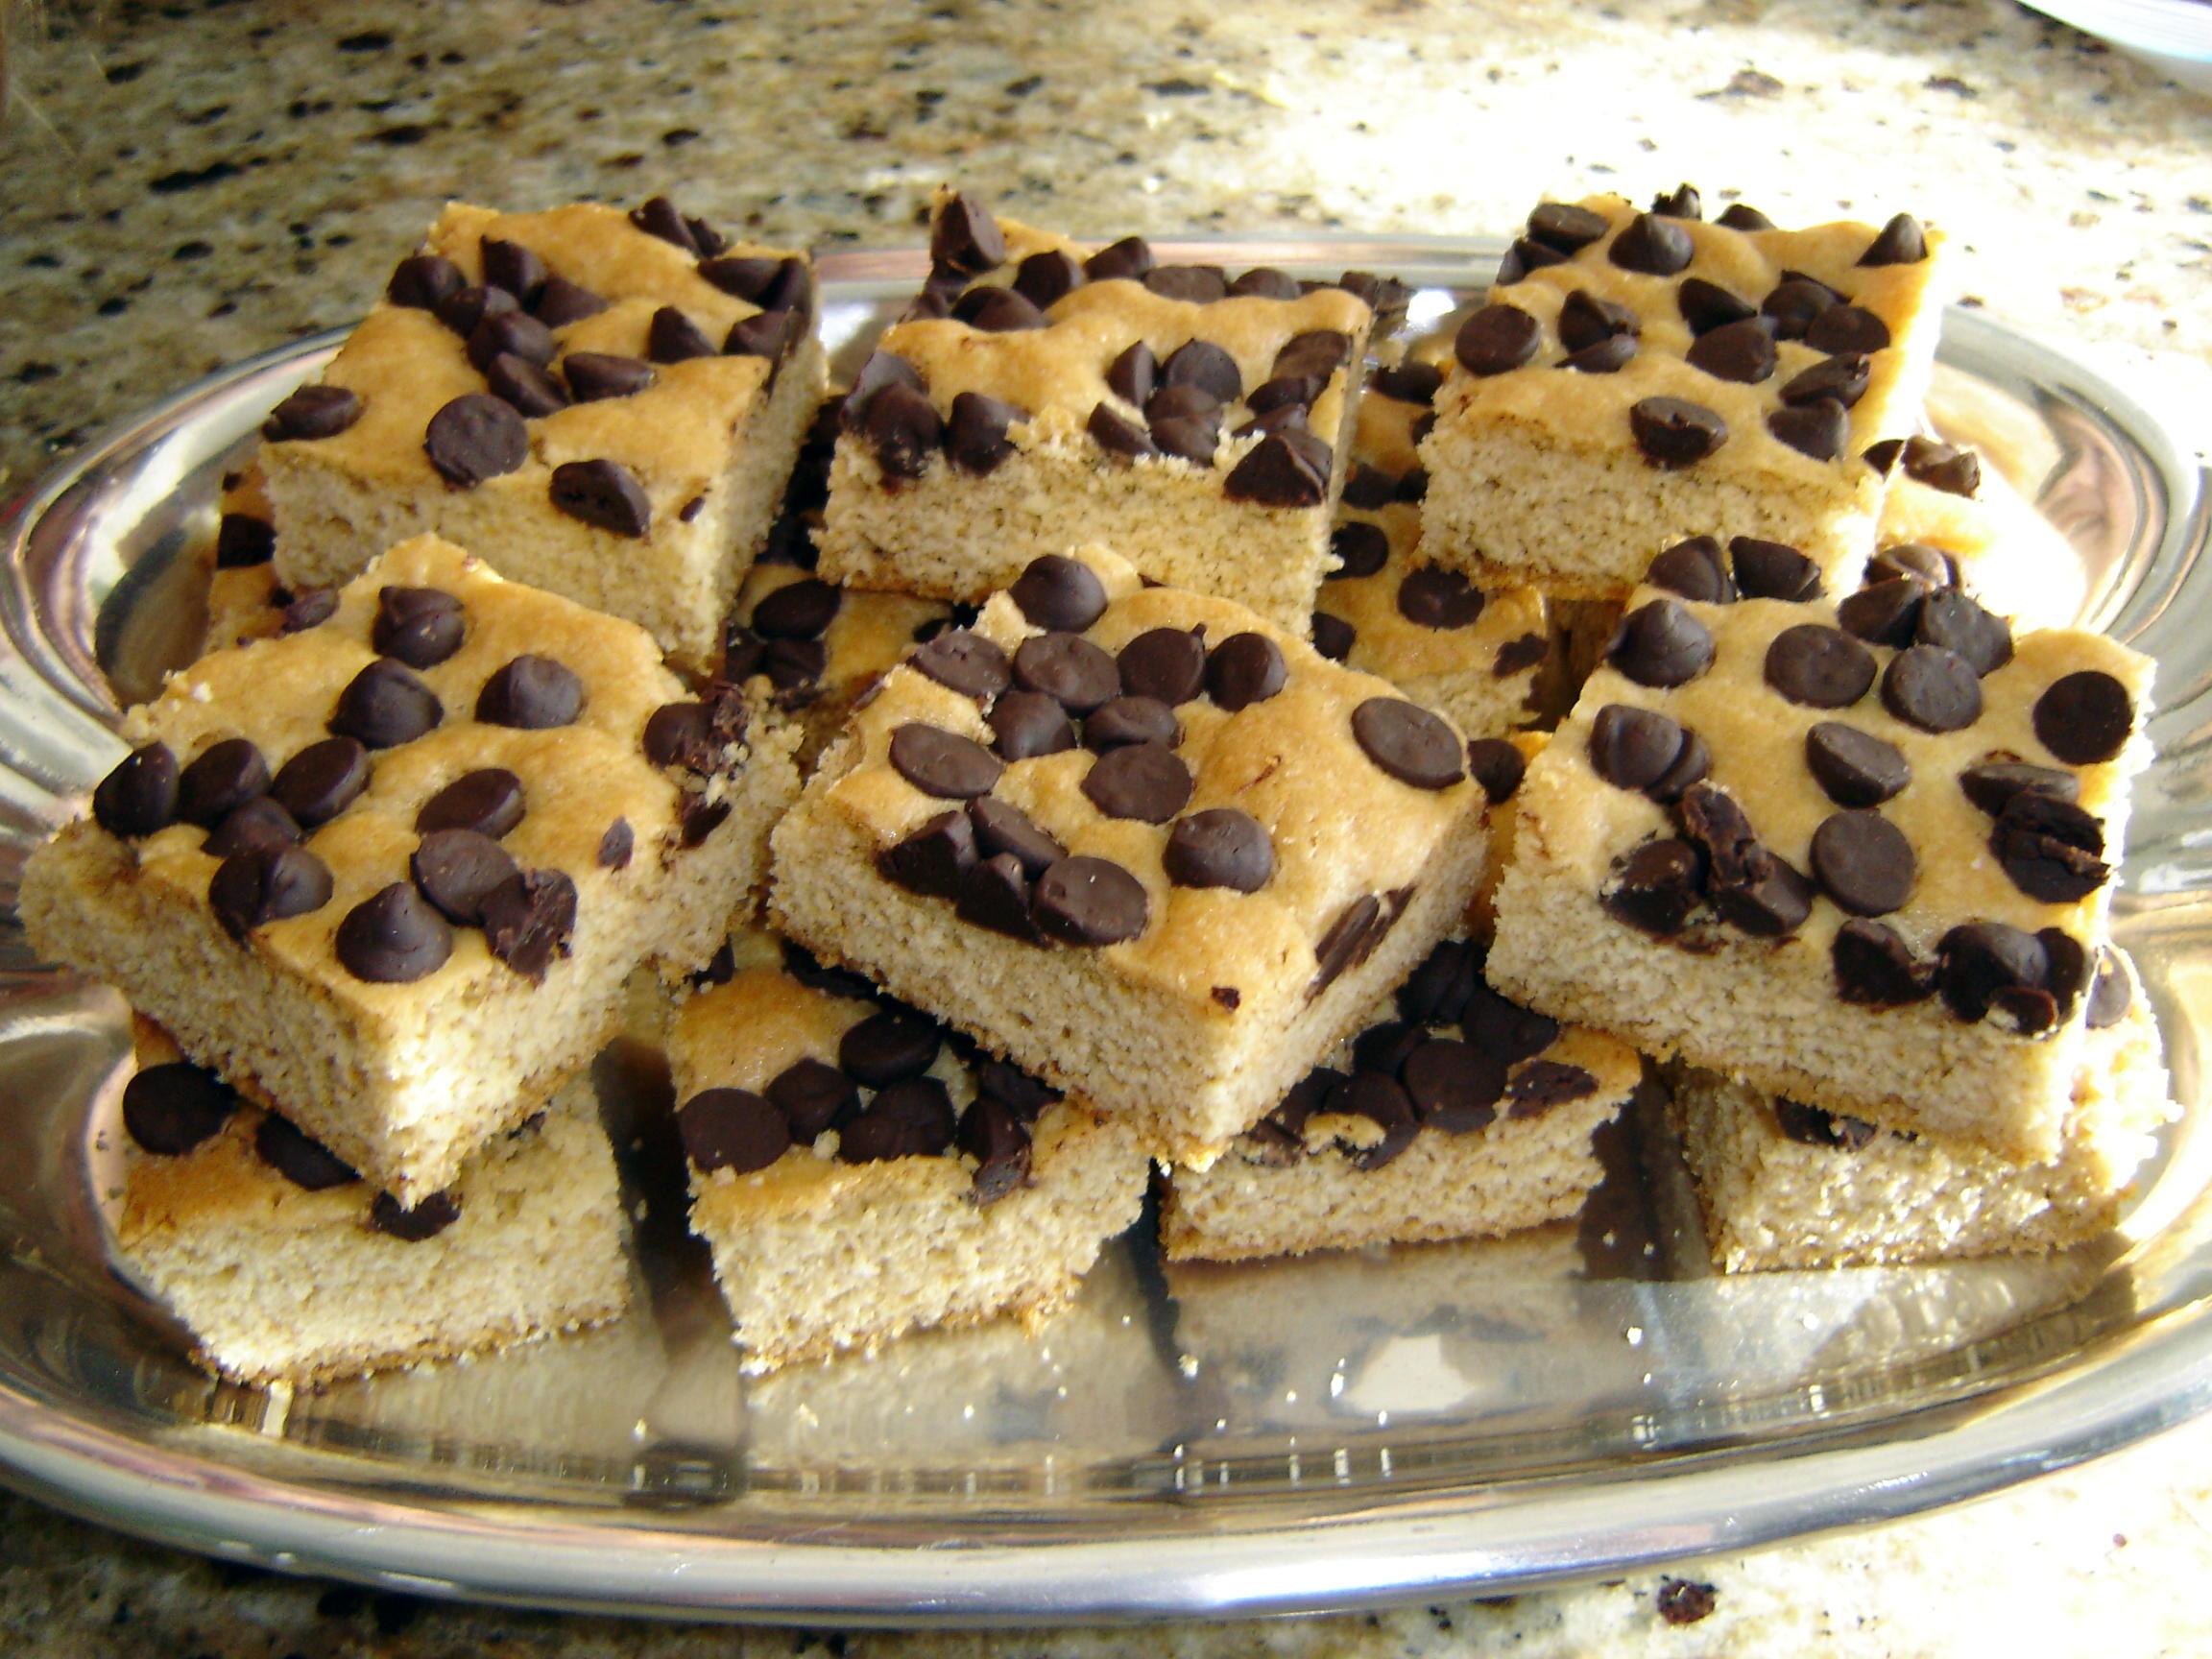 Bisquick Chocolate Chip Bars Recipe